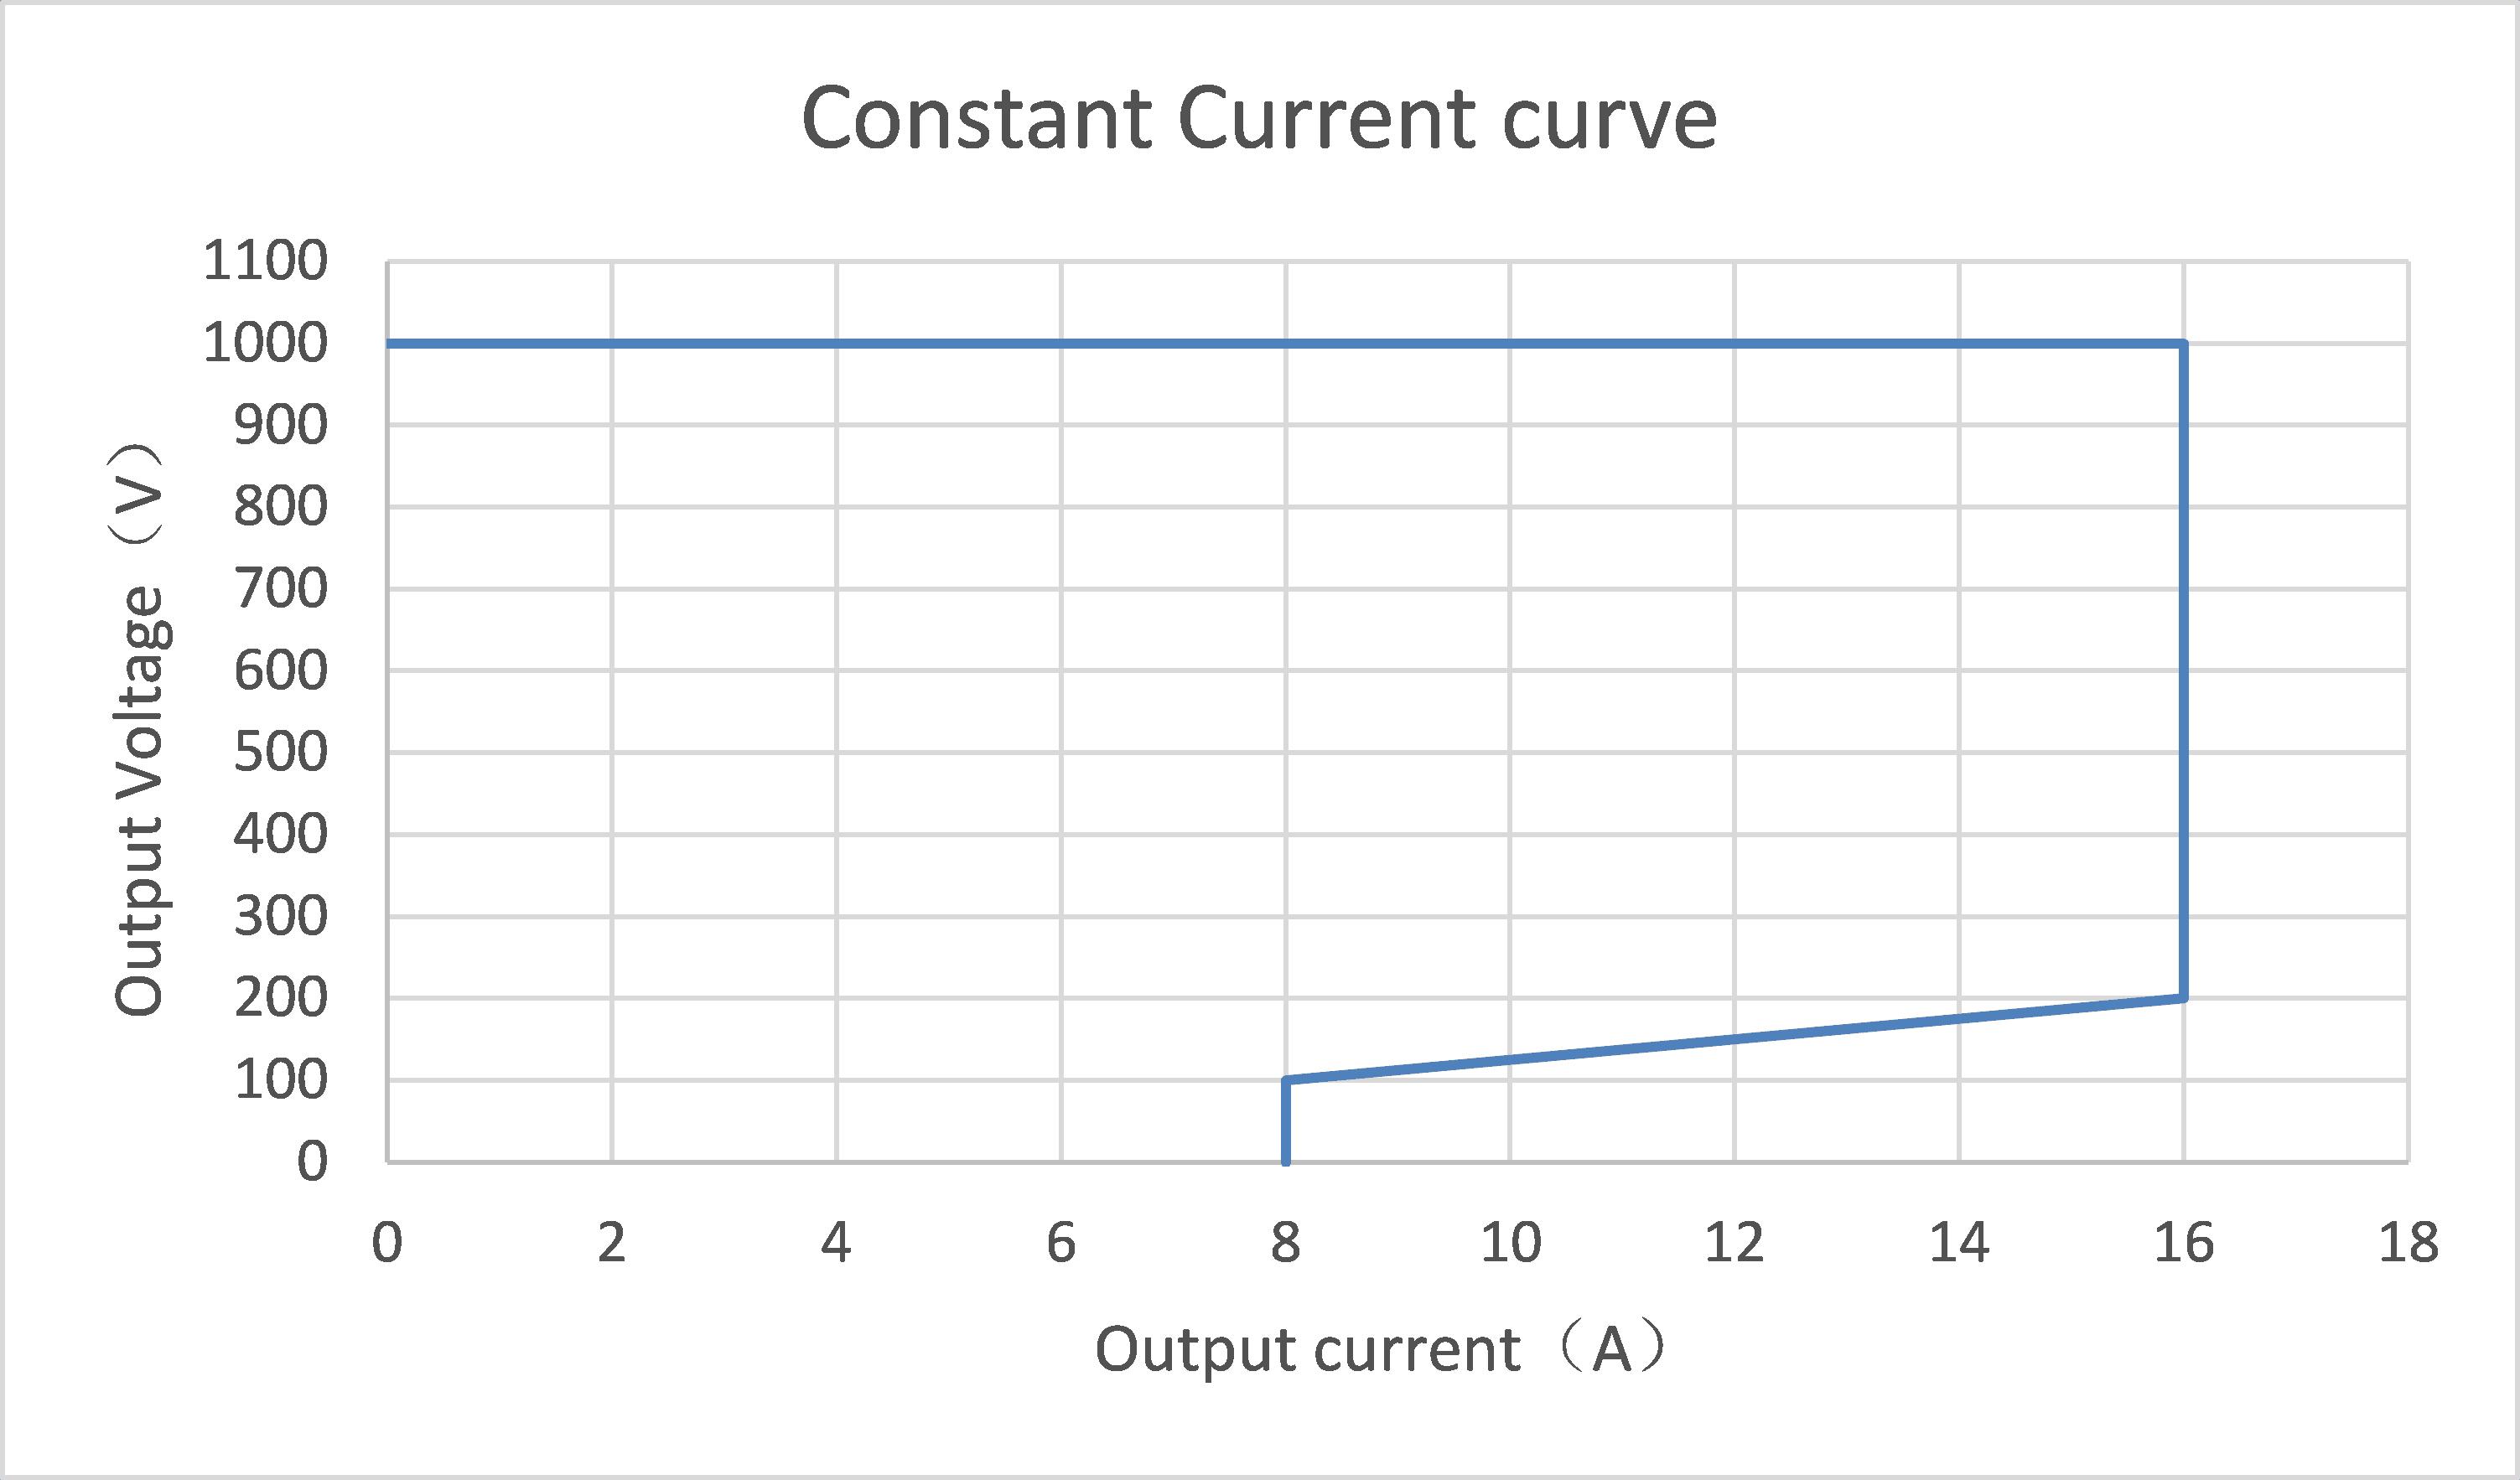 Constant Current curve 1000V